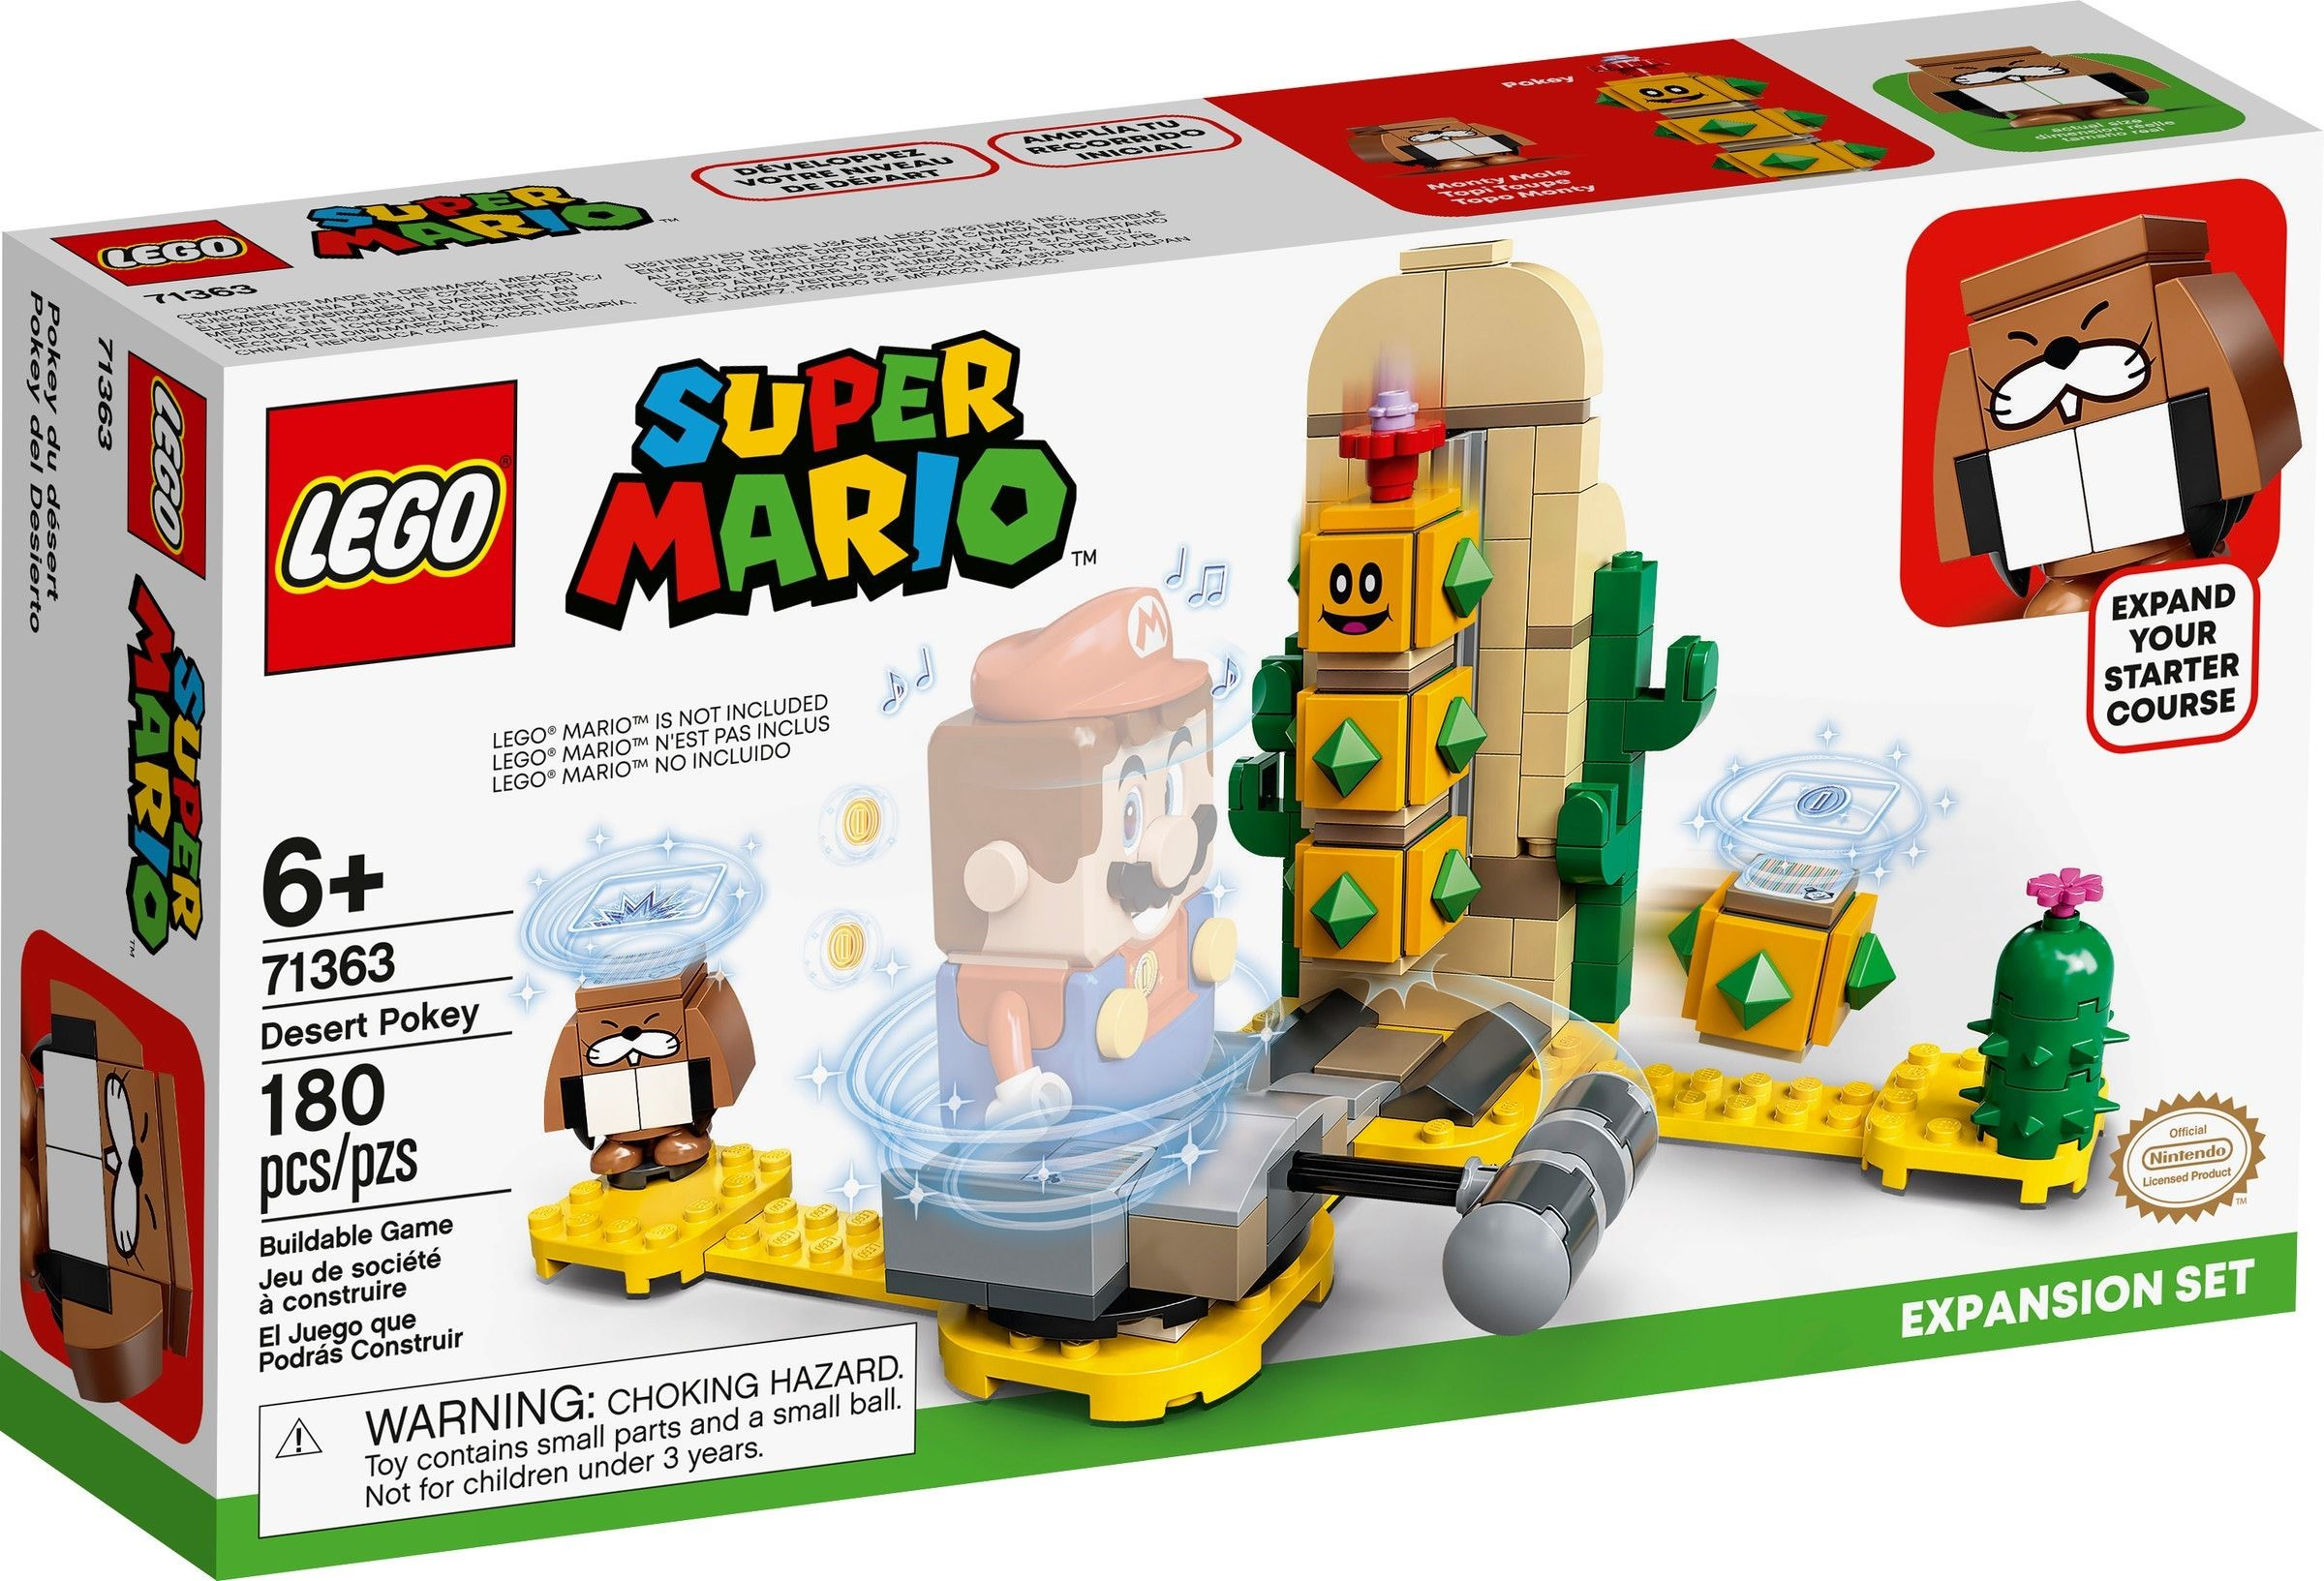 LEGO Super Mario - Desert Pokey Expansion Set (71363)